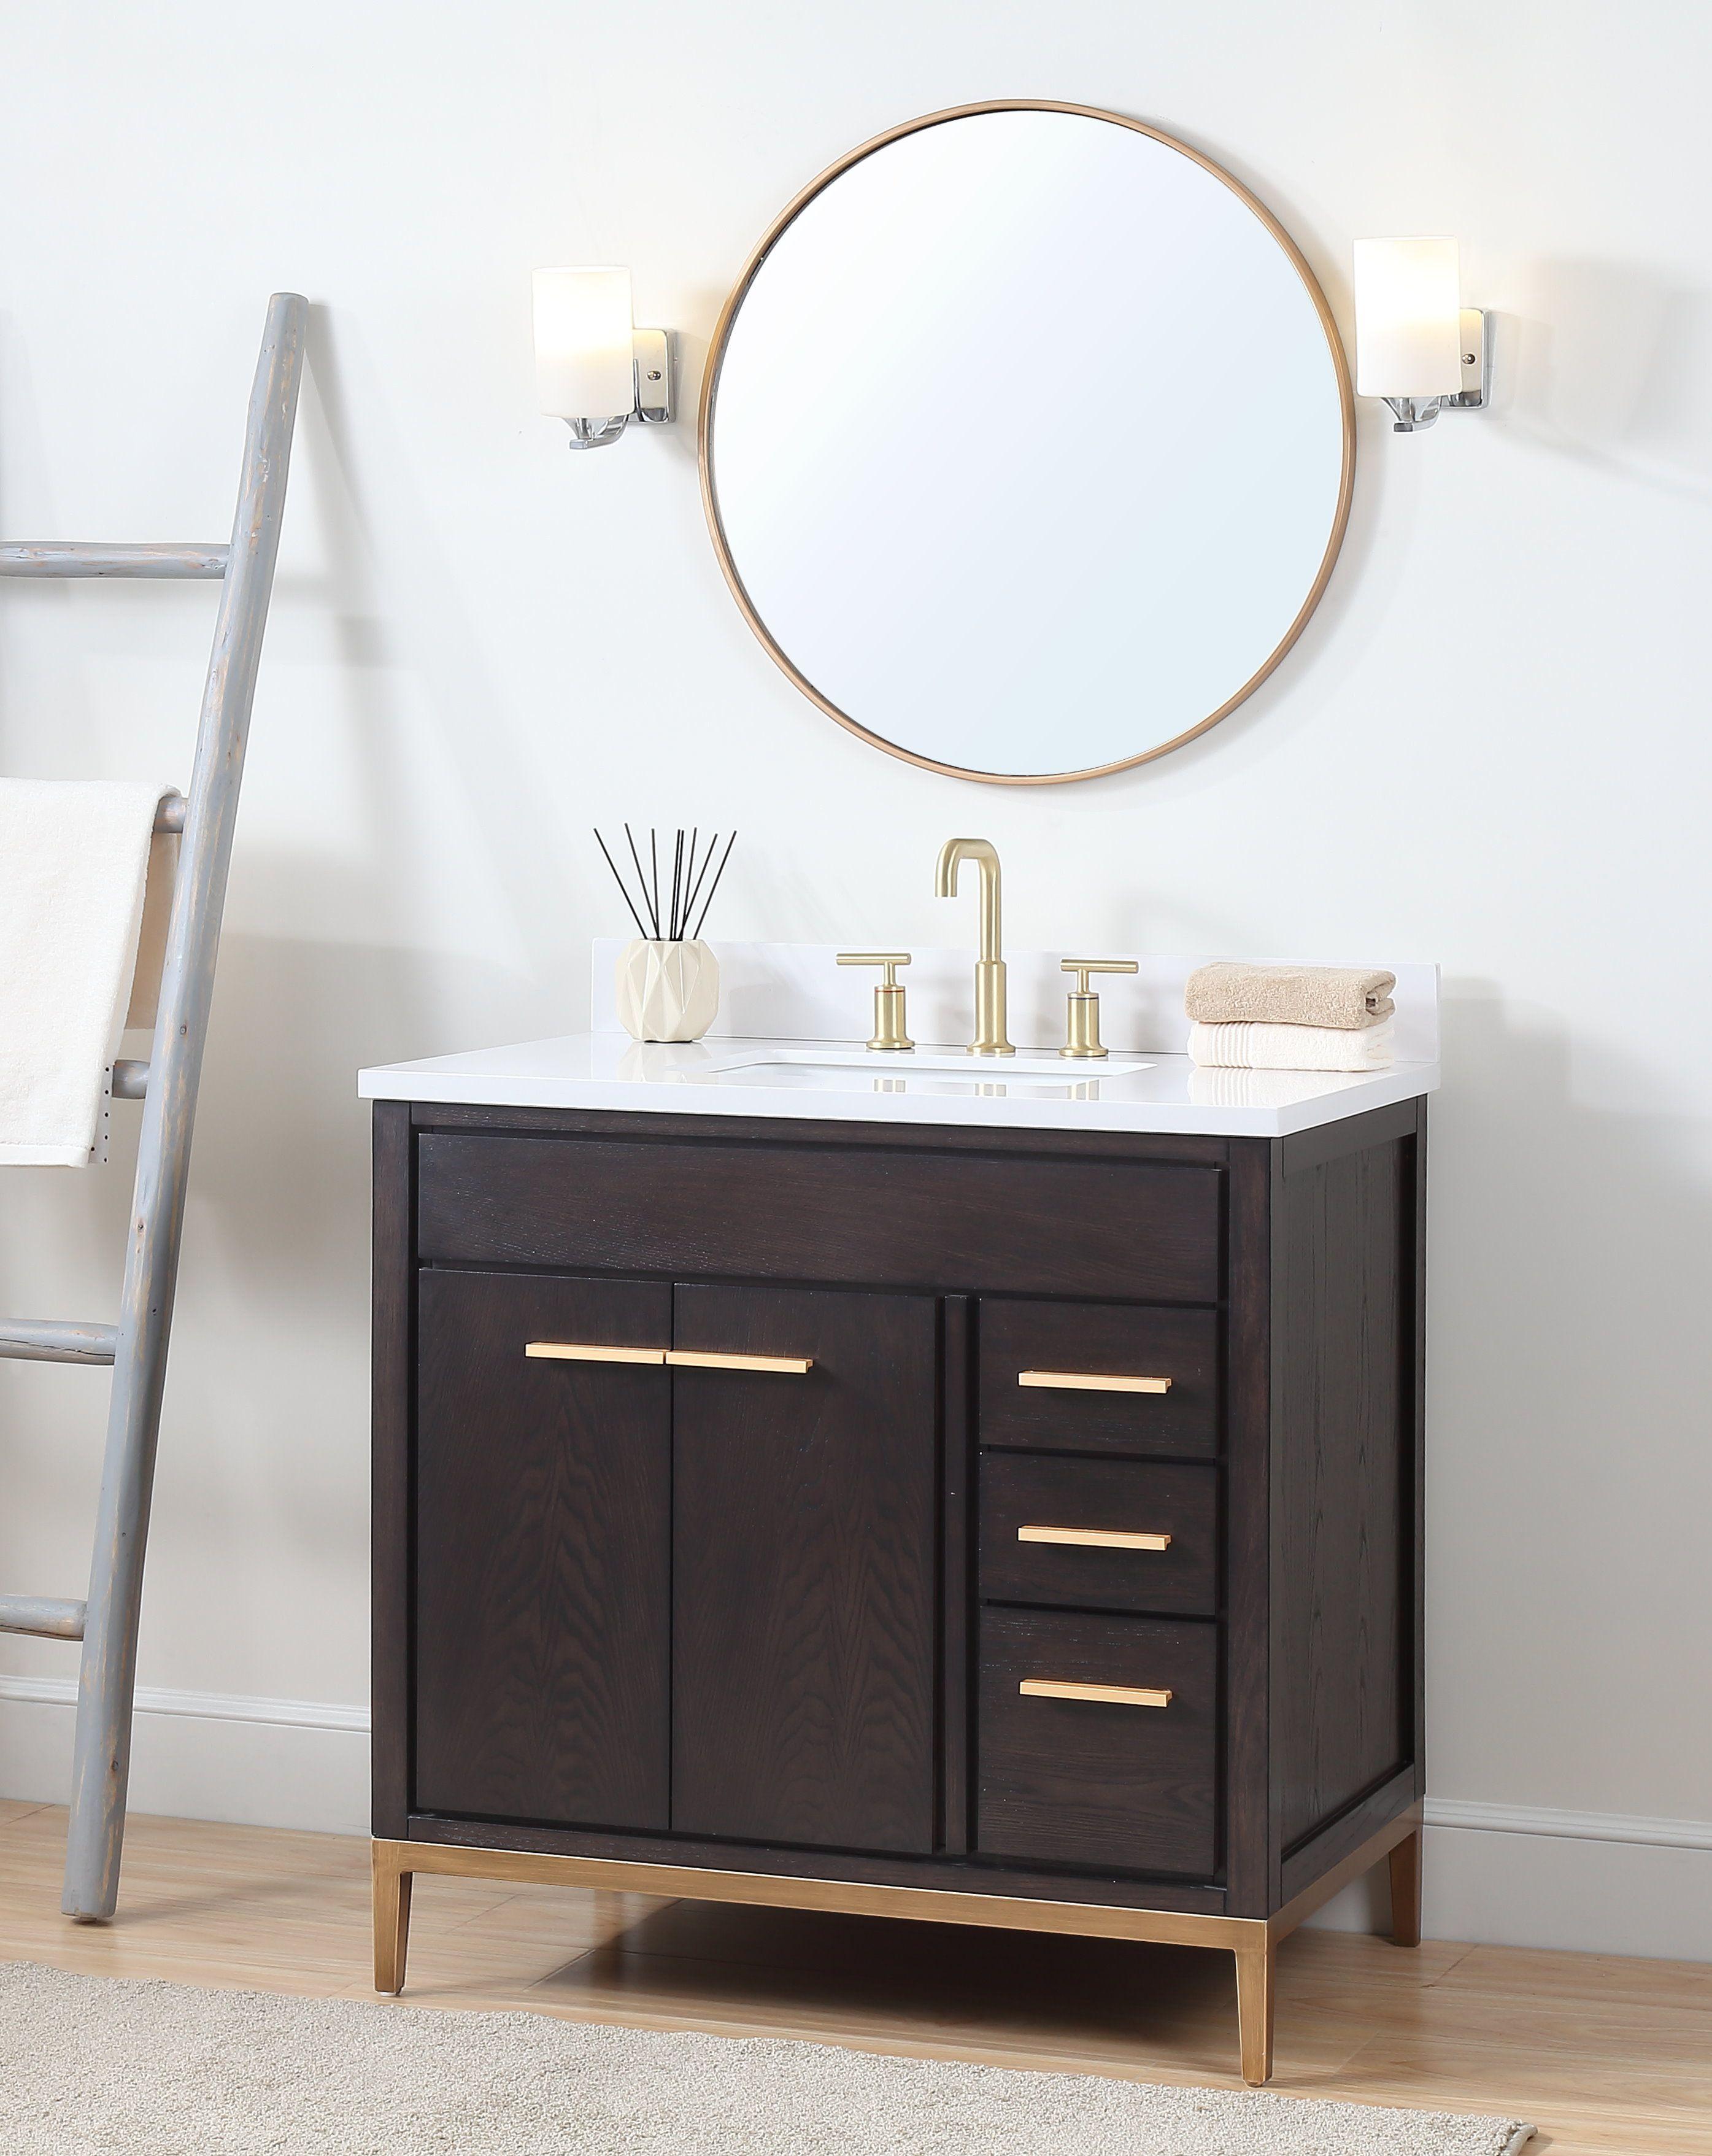 36 Tennant Brand Modern Style Beatrice Bathroom Sink Vanity Tb 9838dk V36 Wenge Finish Bathroom Vanities Without Tops Small Bathroom Makeover Bathroom Interior Design